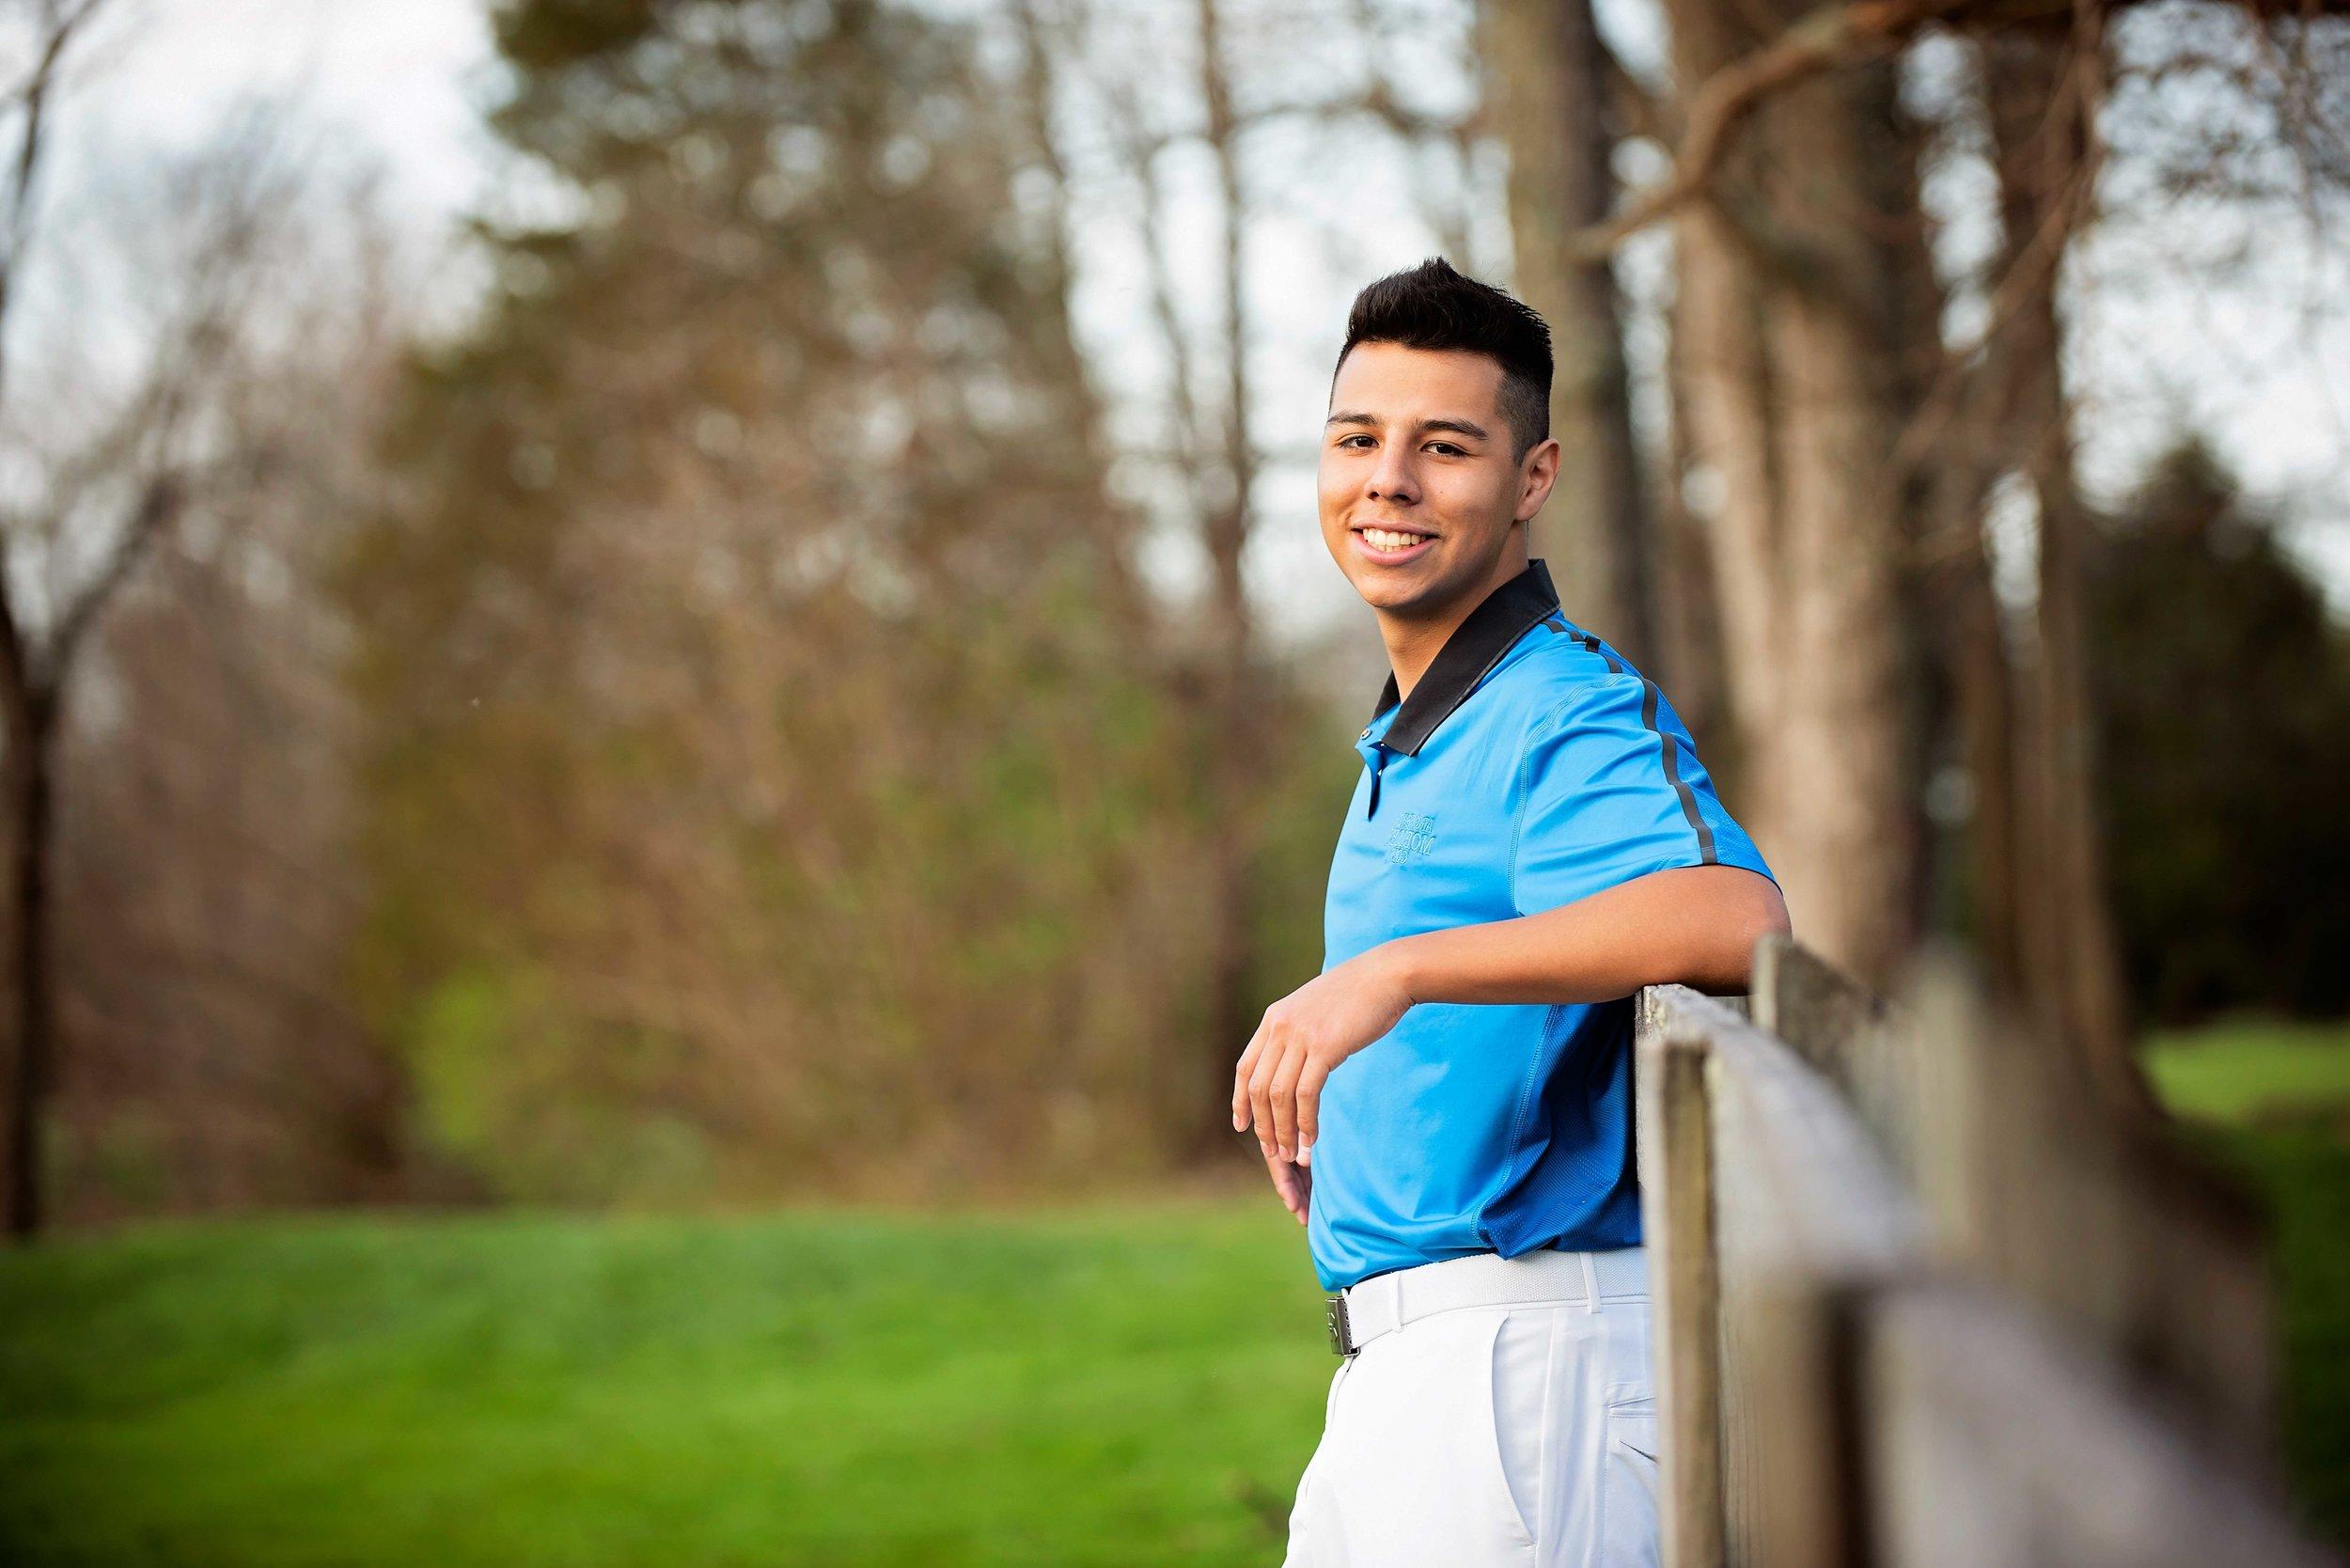 Senior High School Goal Player Leaning Against Fence Cincinnati Remember When Portraits Senior Photographer